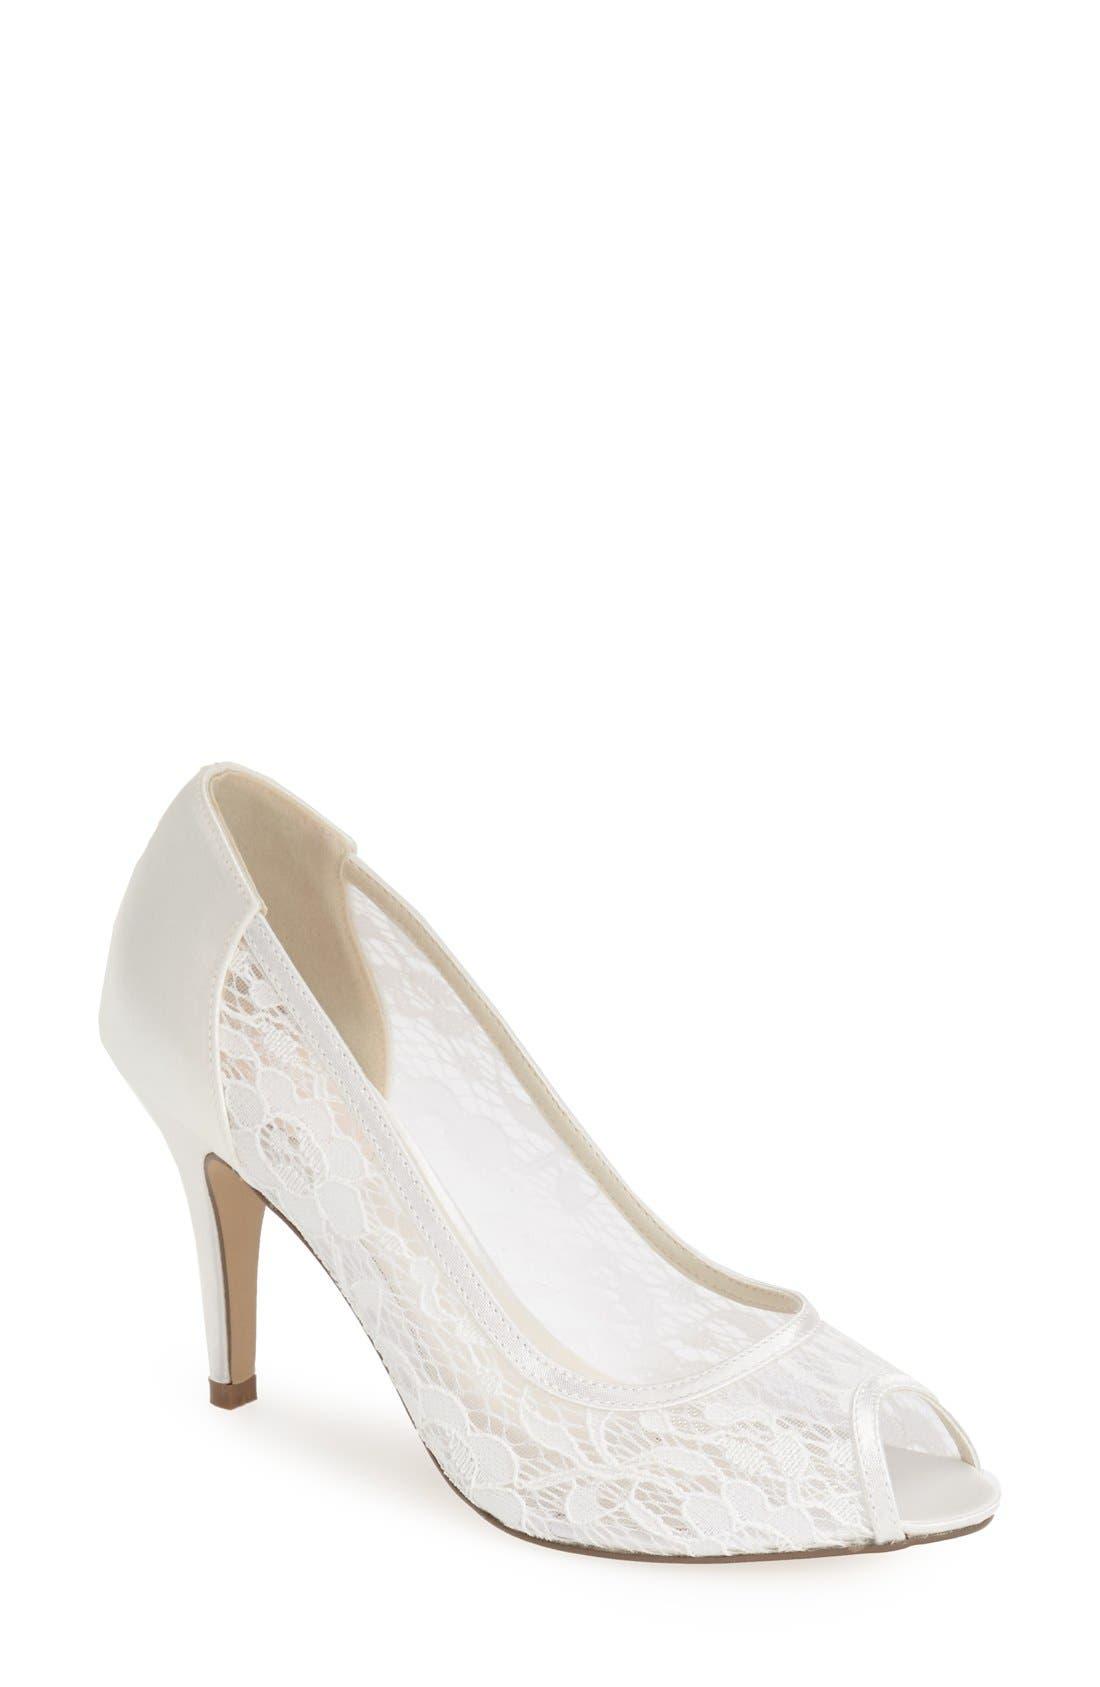 PINK PARADOX LONDON Scrumptious Lace Peep Toe Sandal